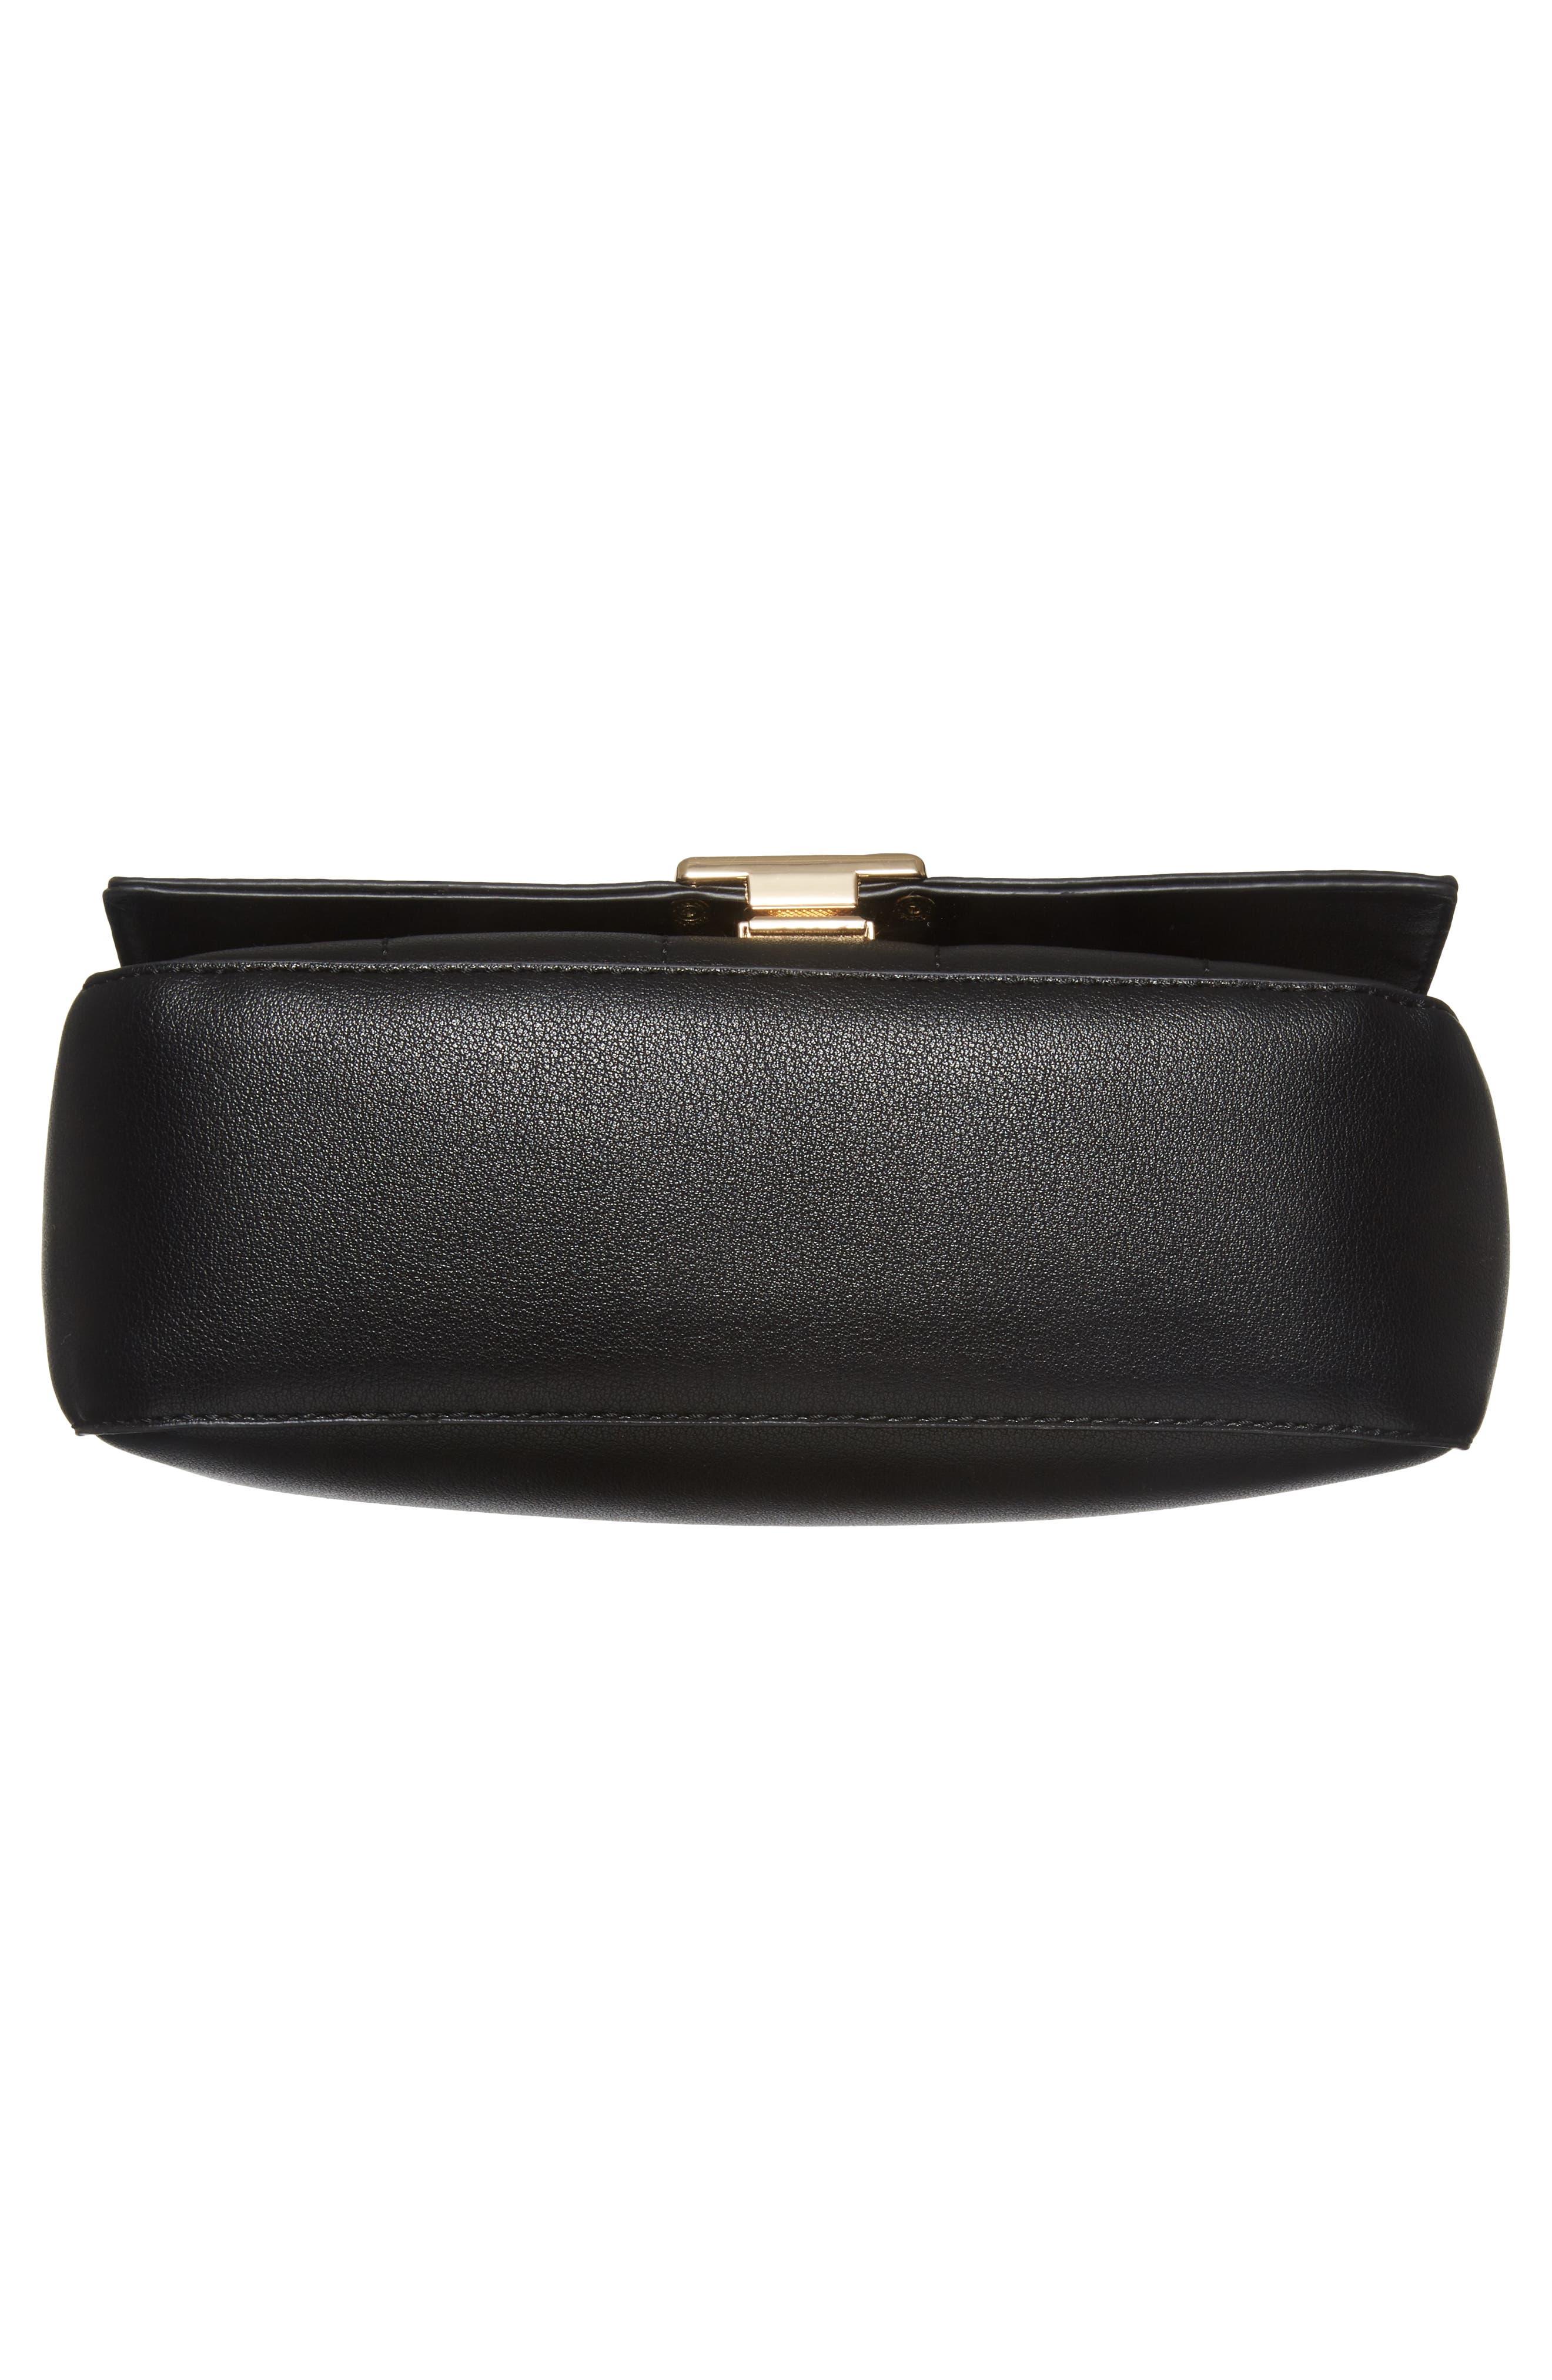 Colie Faux Leather Crossbody Bag,                             Alternate thumbnail 6, color,                             001